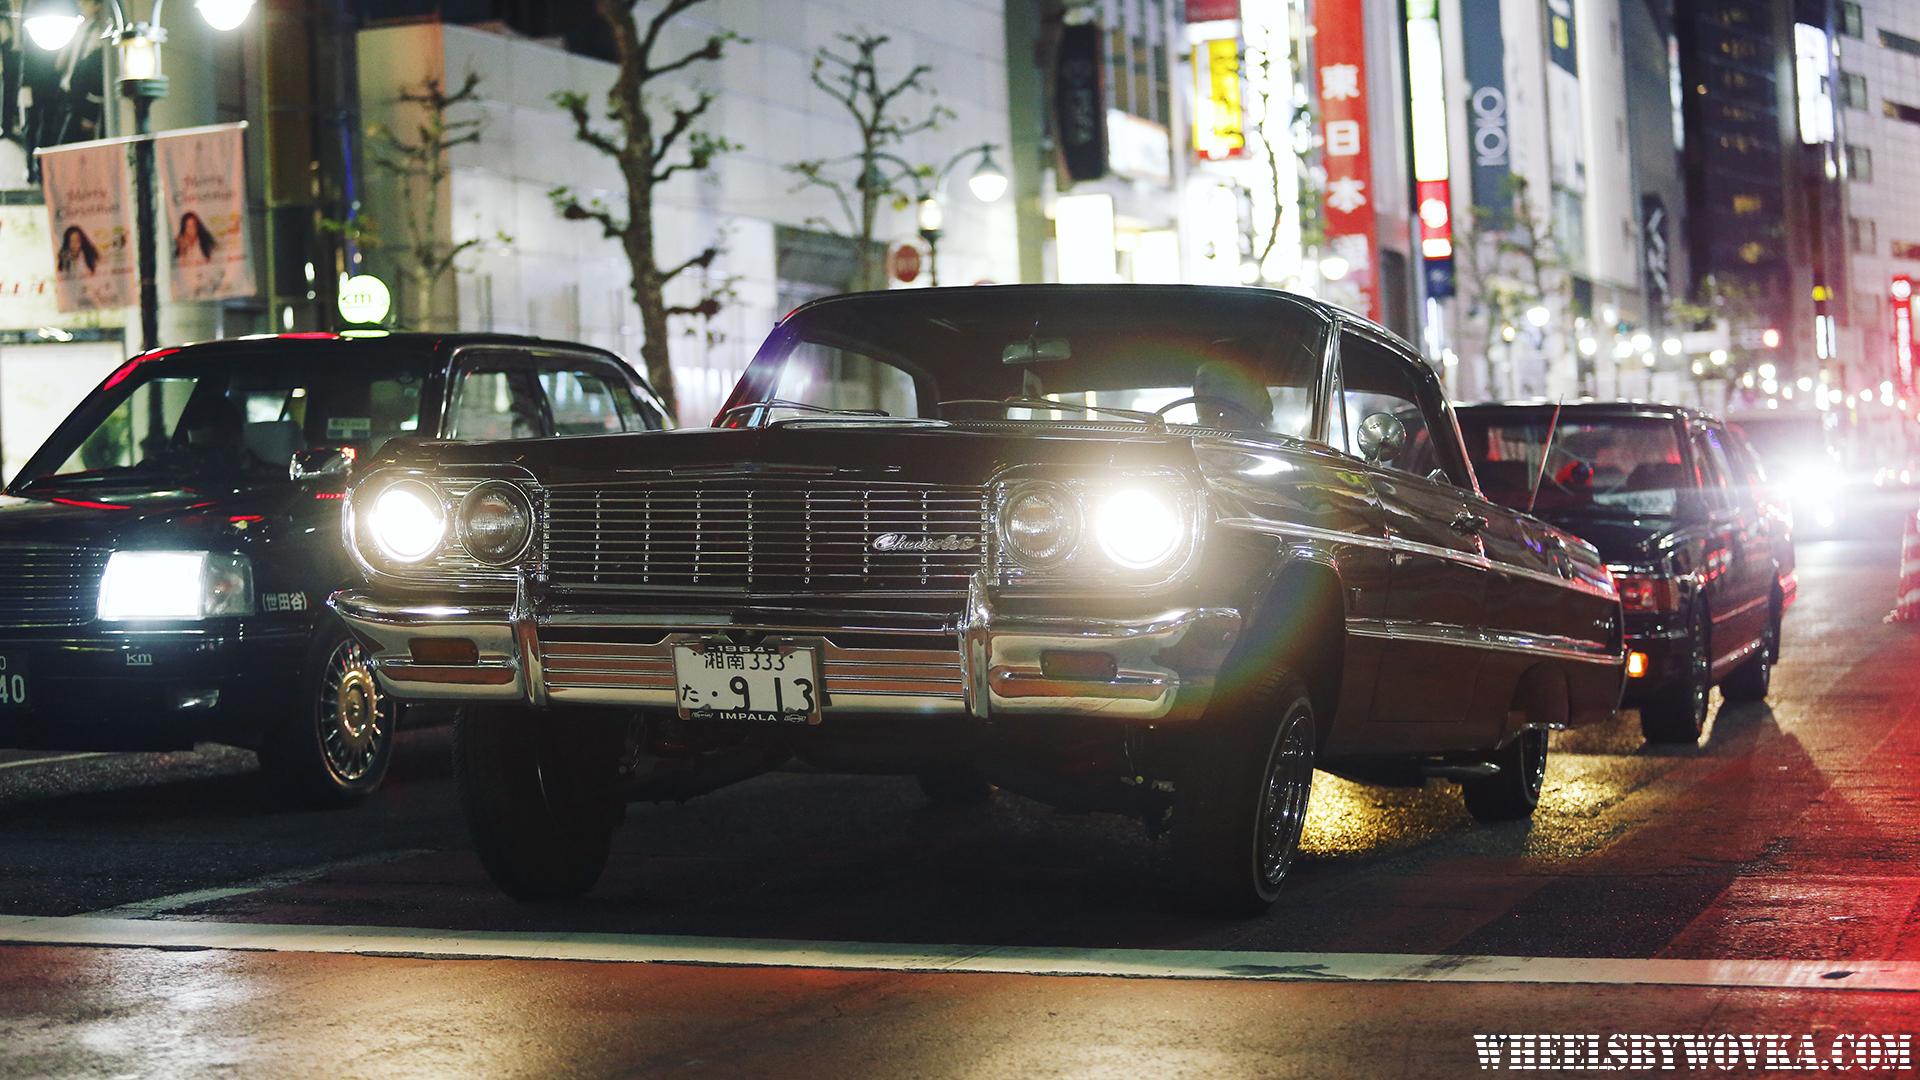 shibuya-japan-tokyo-lowrider-cruise-night-17